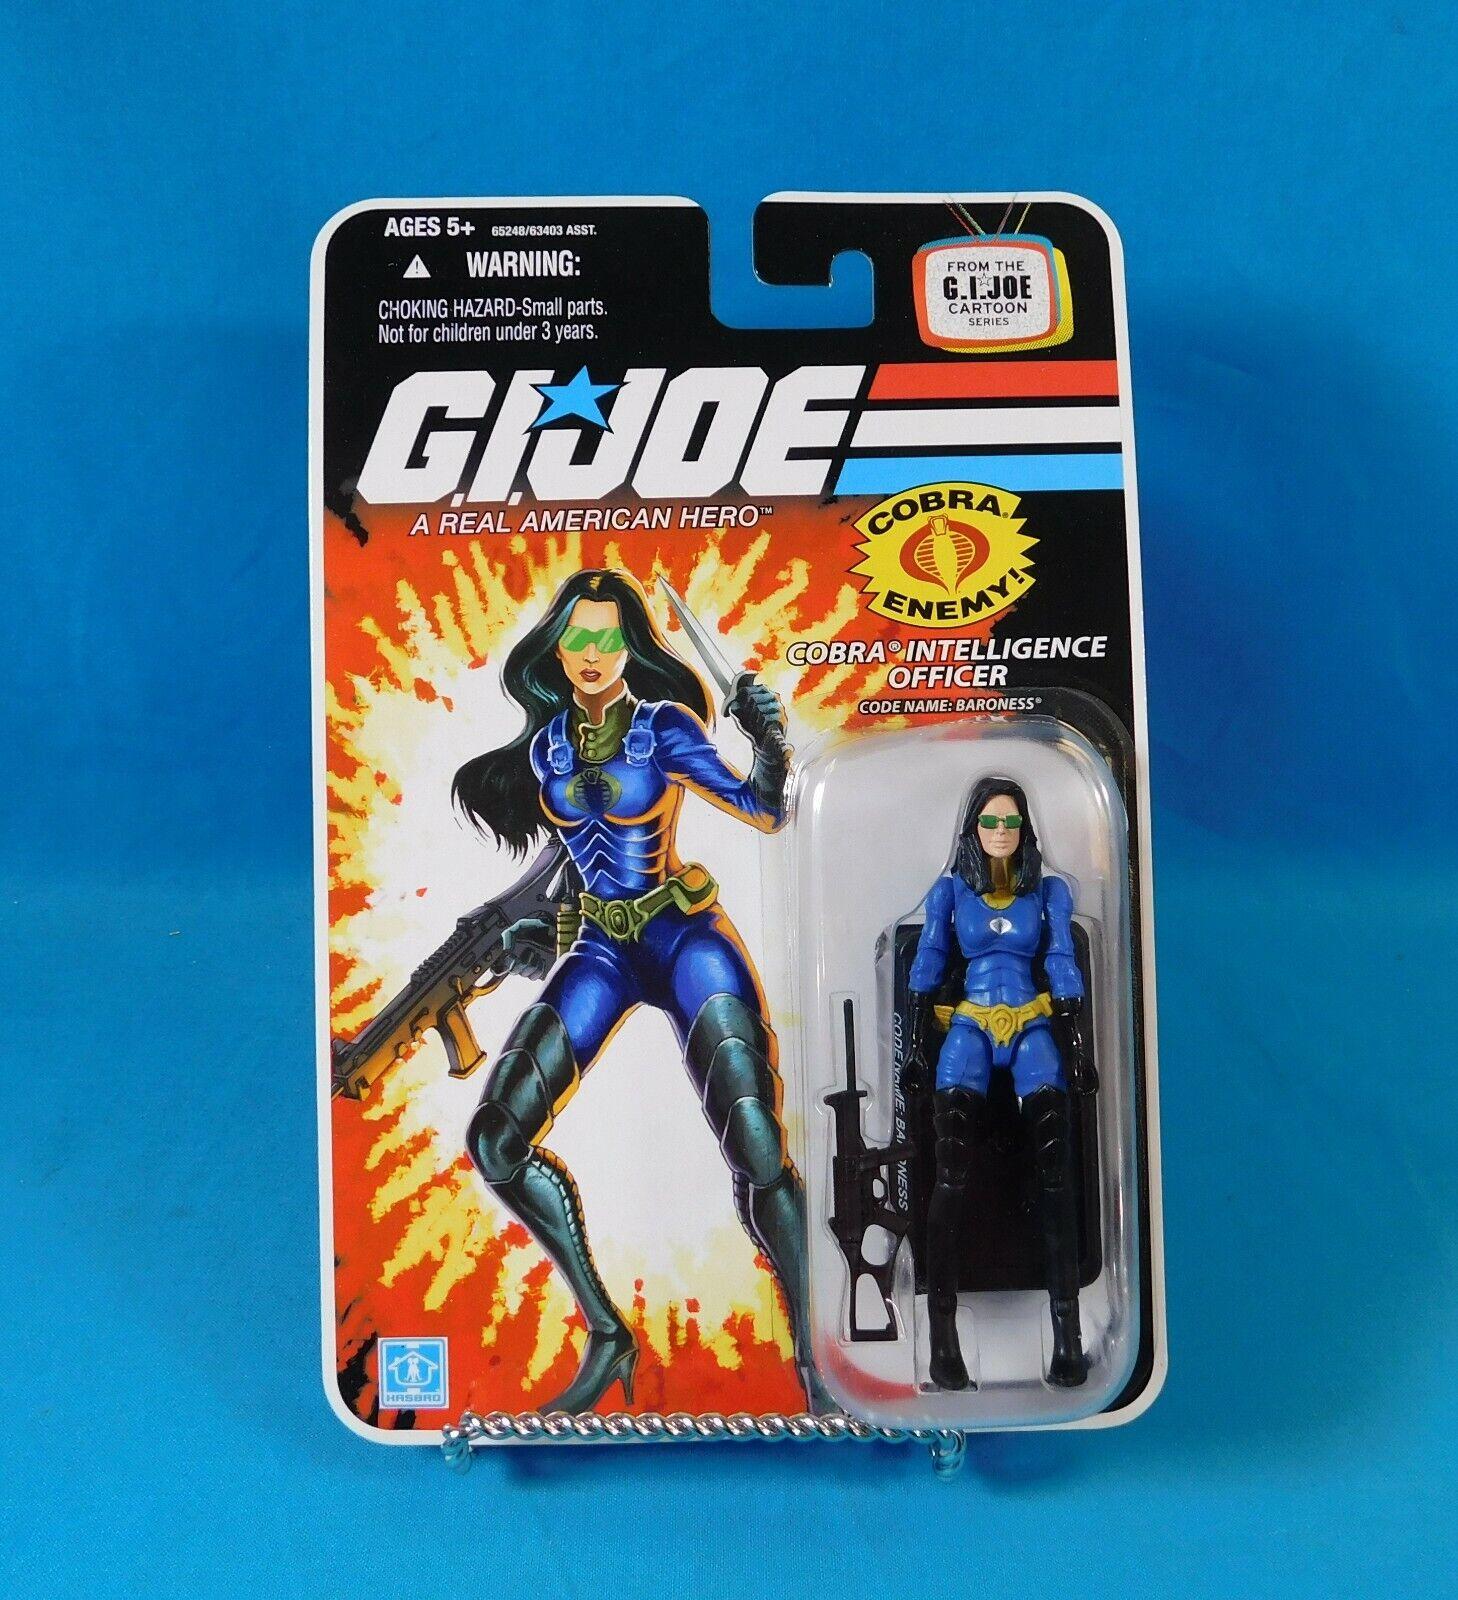 GI Joe body part 2004 Cobra Ninja Trooper Bras Set C8.5 très bon état